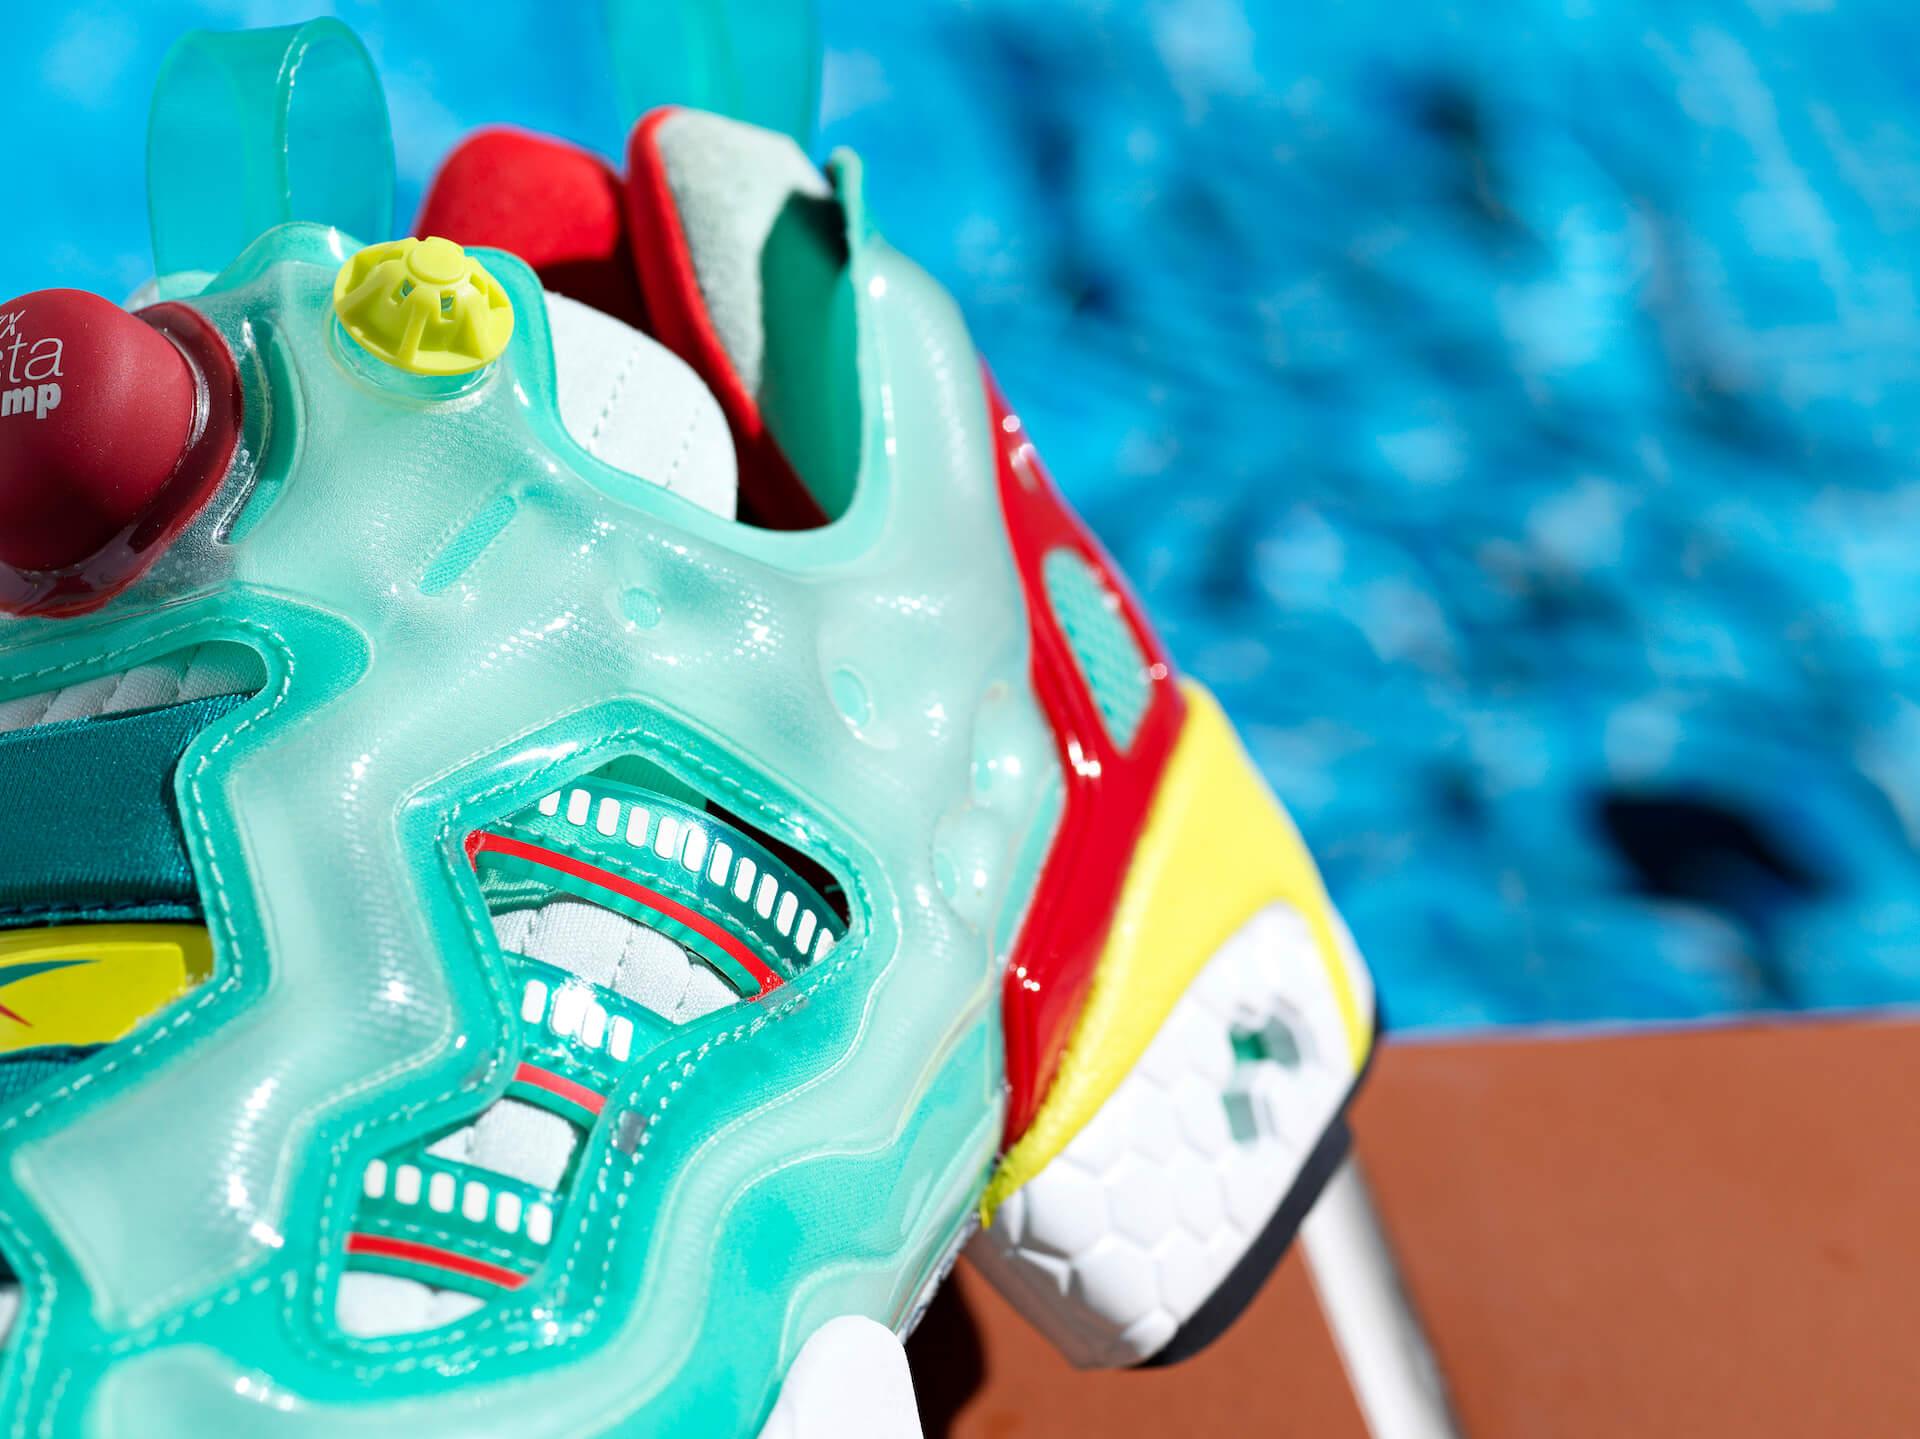 adidas OriginalsとReebokのコラボモデル「ZX FURY」に夏にぴったりの新色4色が登場! life210719_adidasoriginals_reebok_6